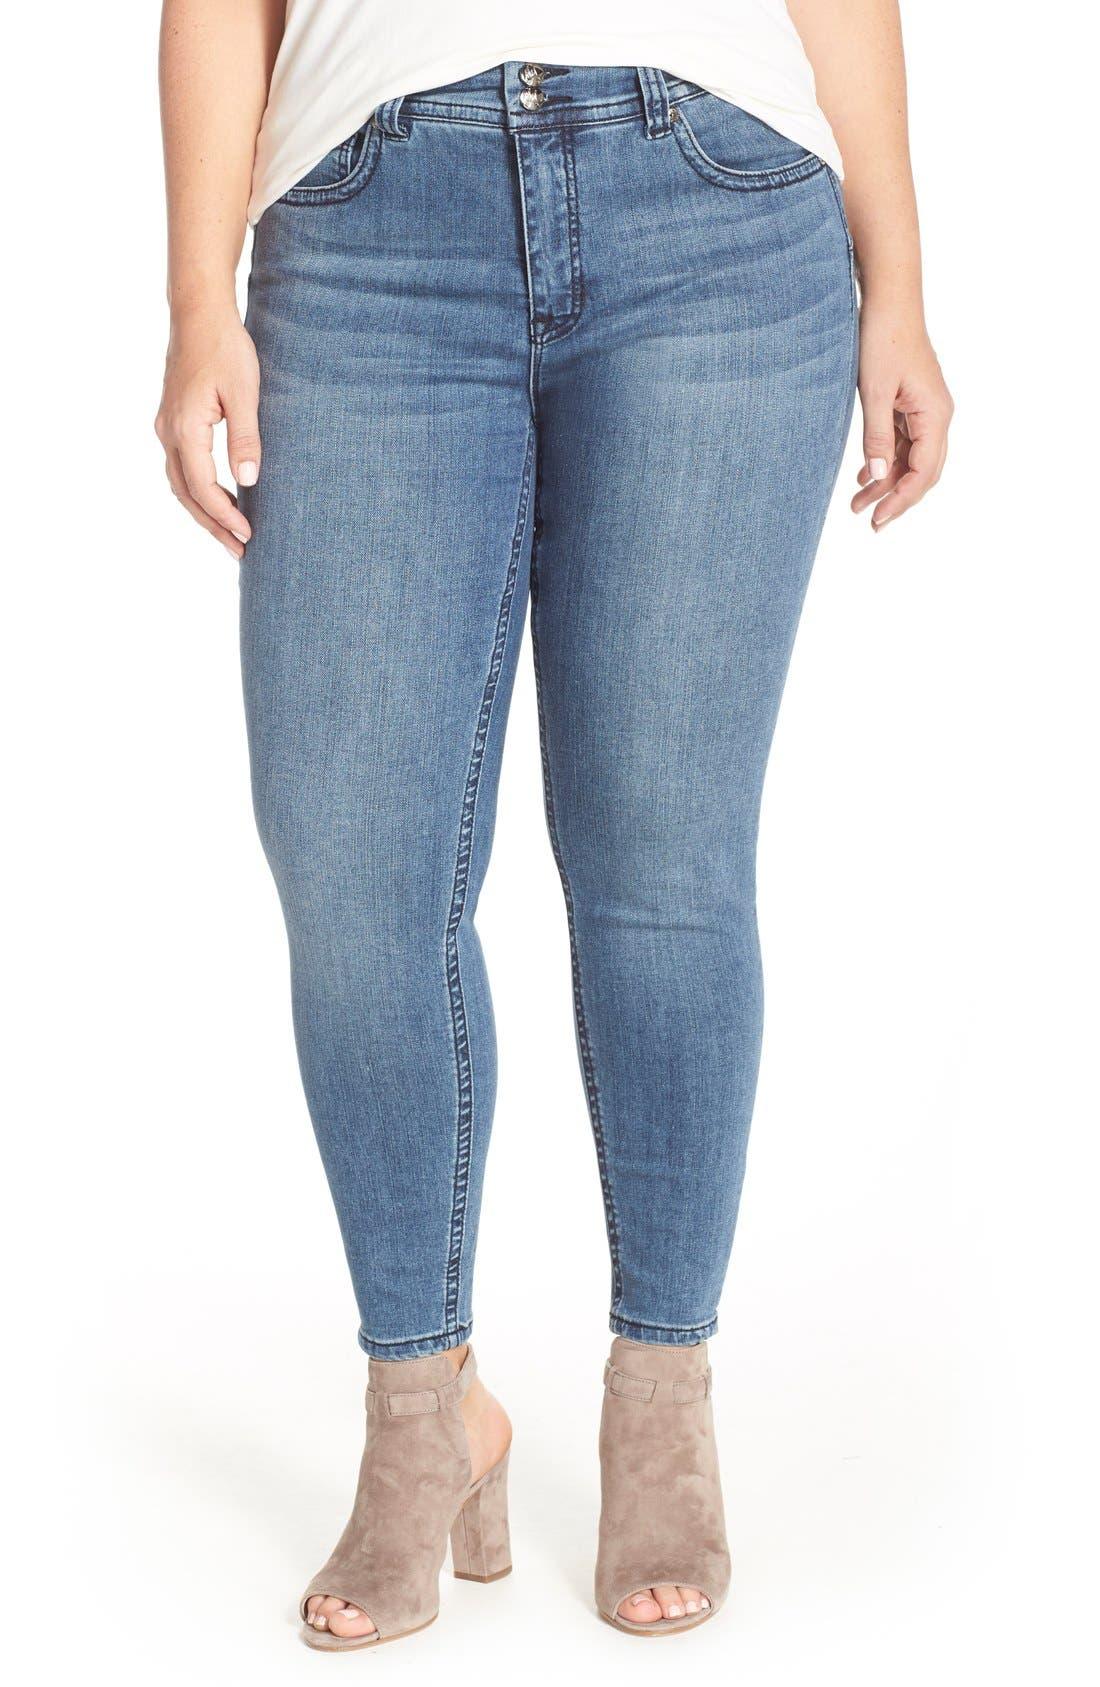 Melissa McCarthy Seven7 High Waist Stretch Pencil Jeans (Hampton) (Plus Size)